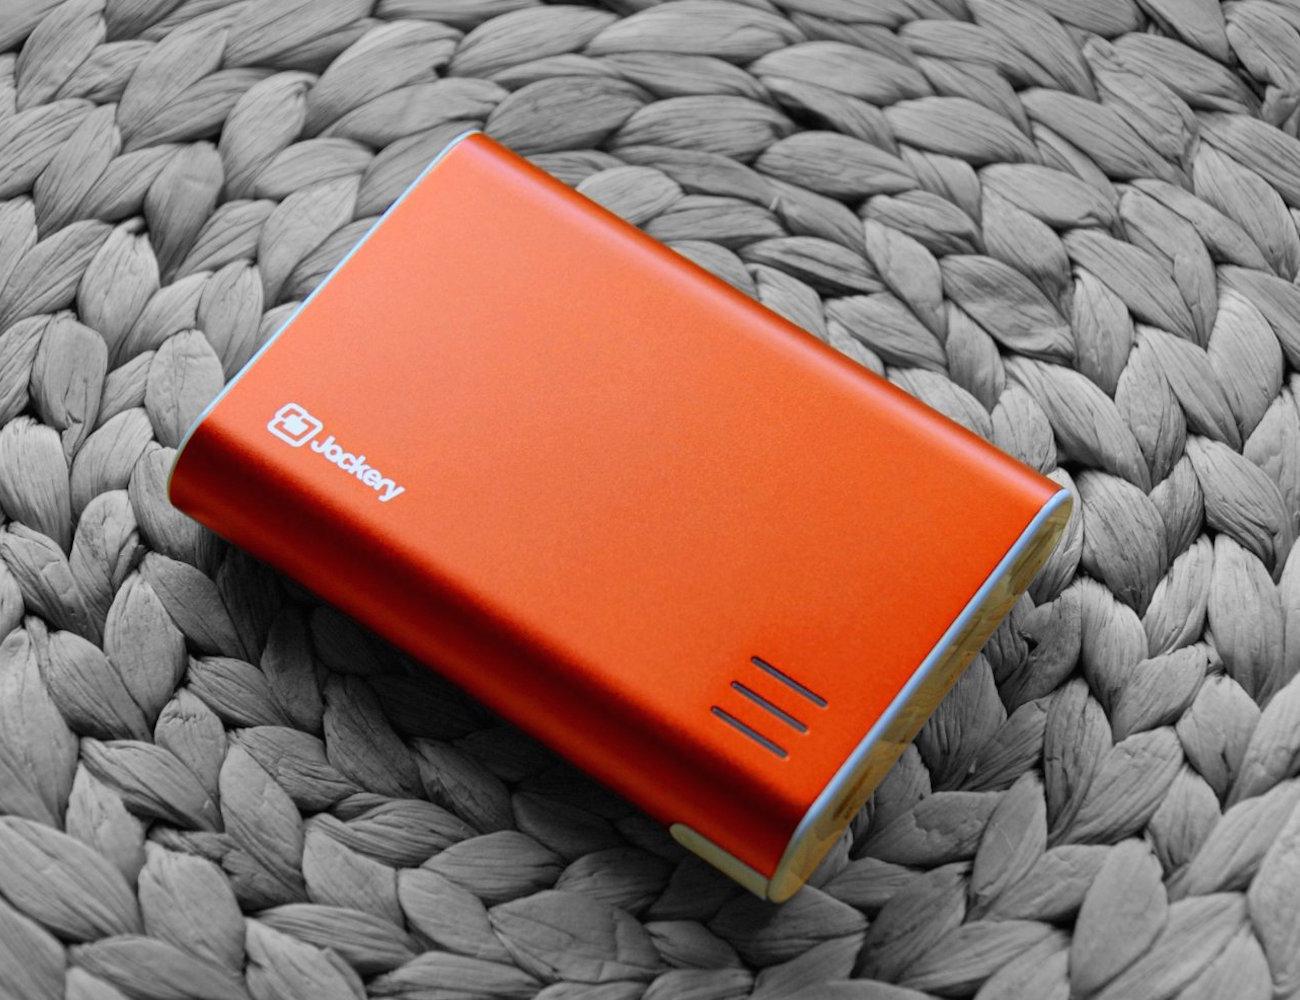 jackery-giant-2-usb-portable-external-battery-charger-01